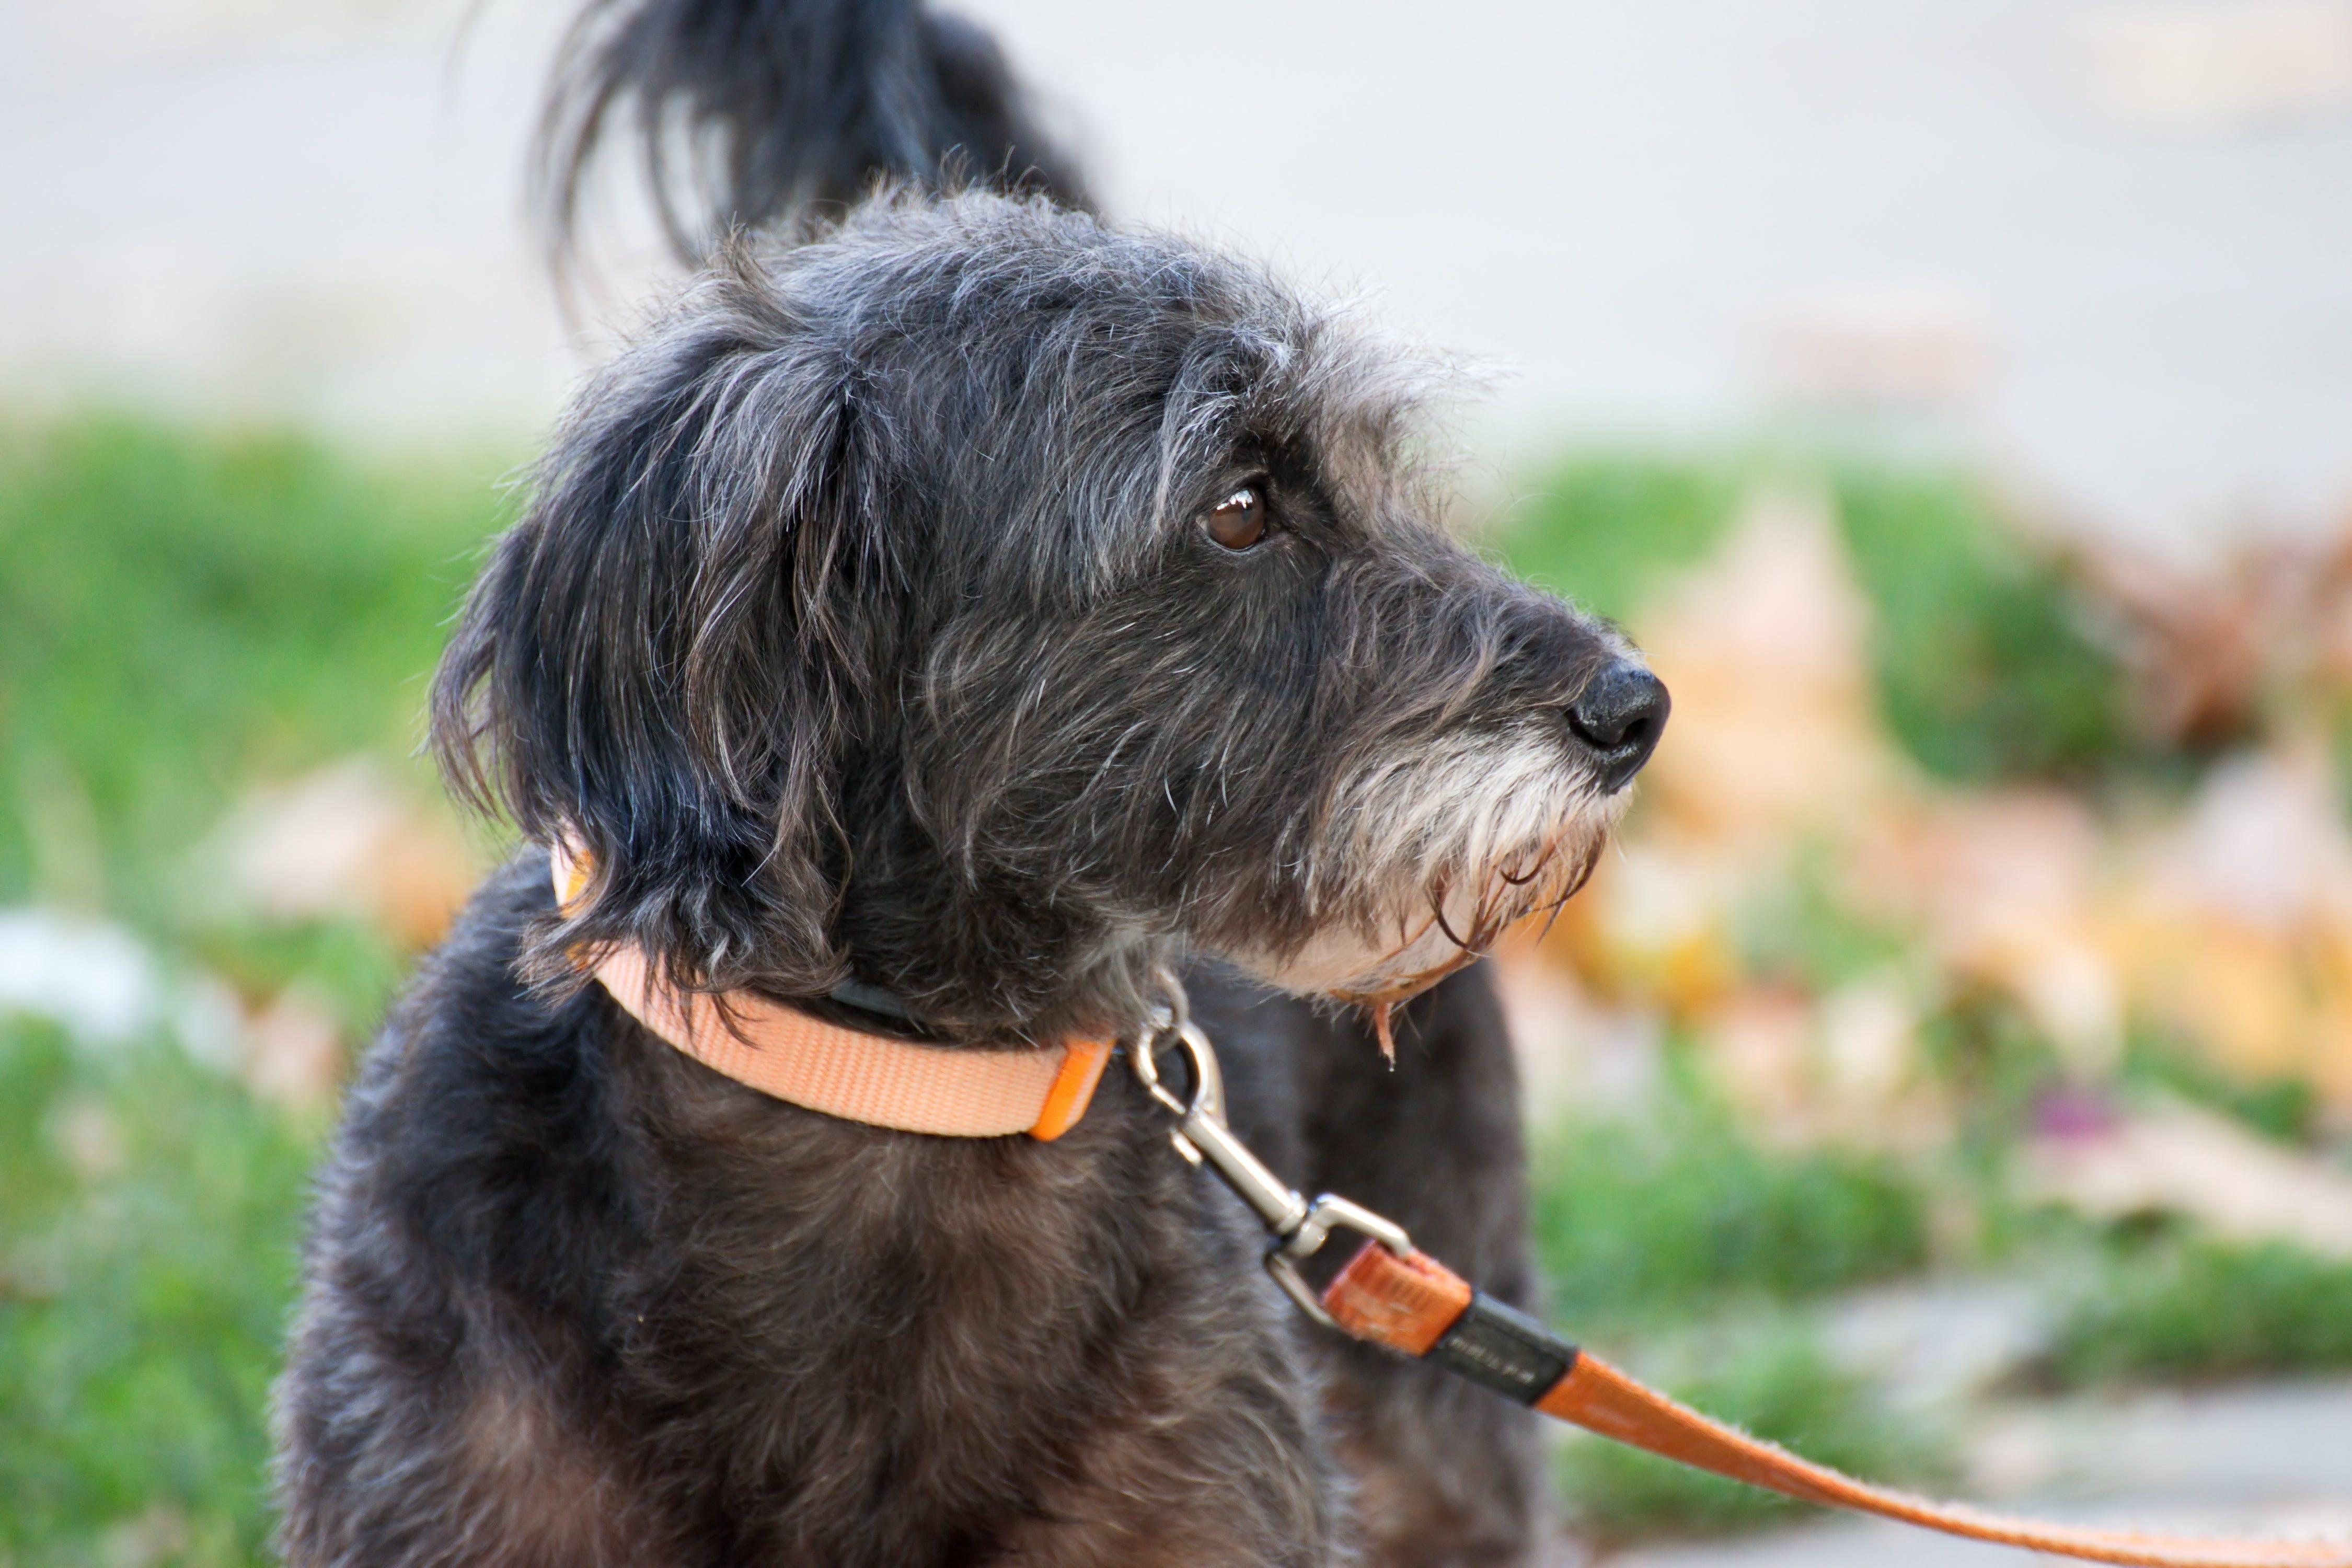 Black Dog Close-up Photography